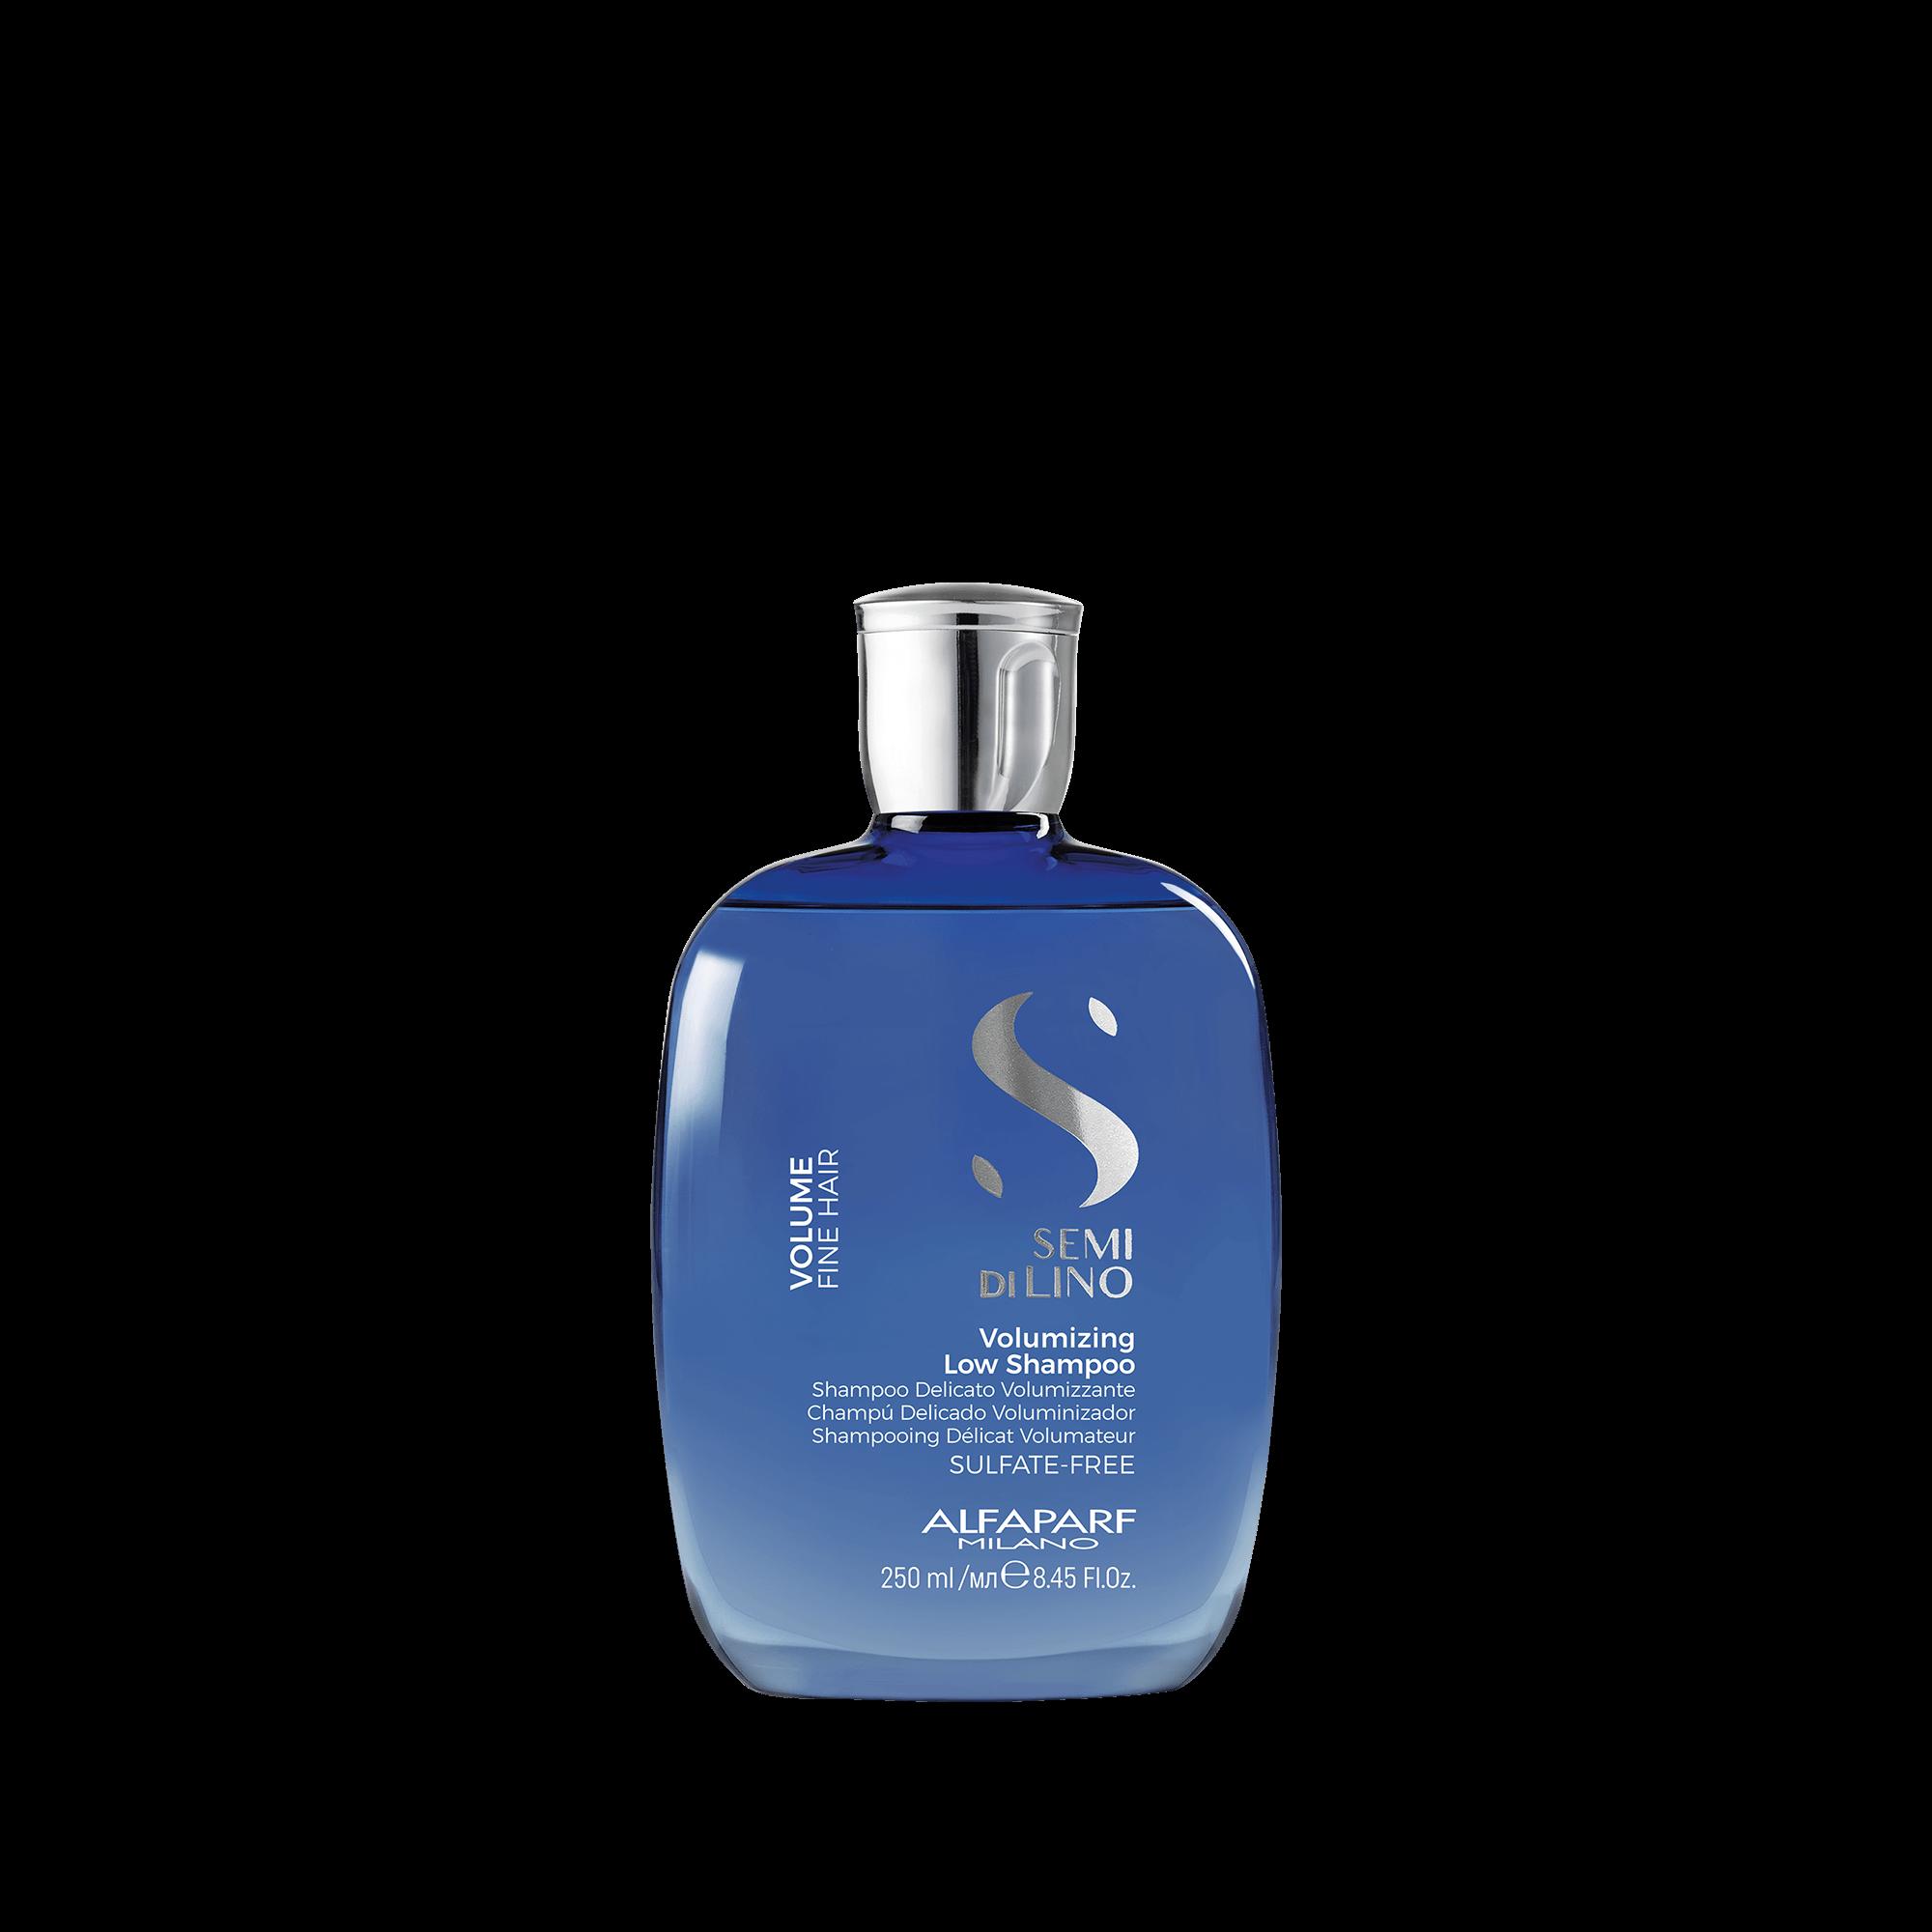 Semi DiLino Volumizing Low Shampoo  (Fine Hair/ Oily Scalp) Image